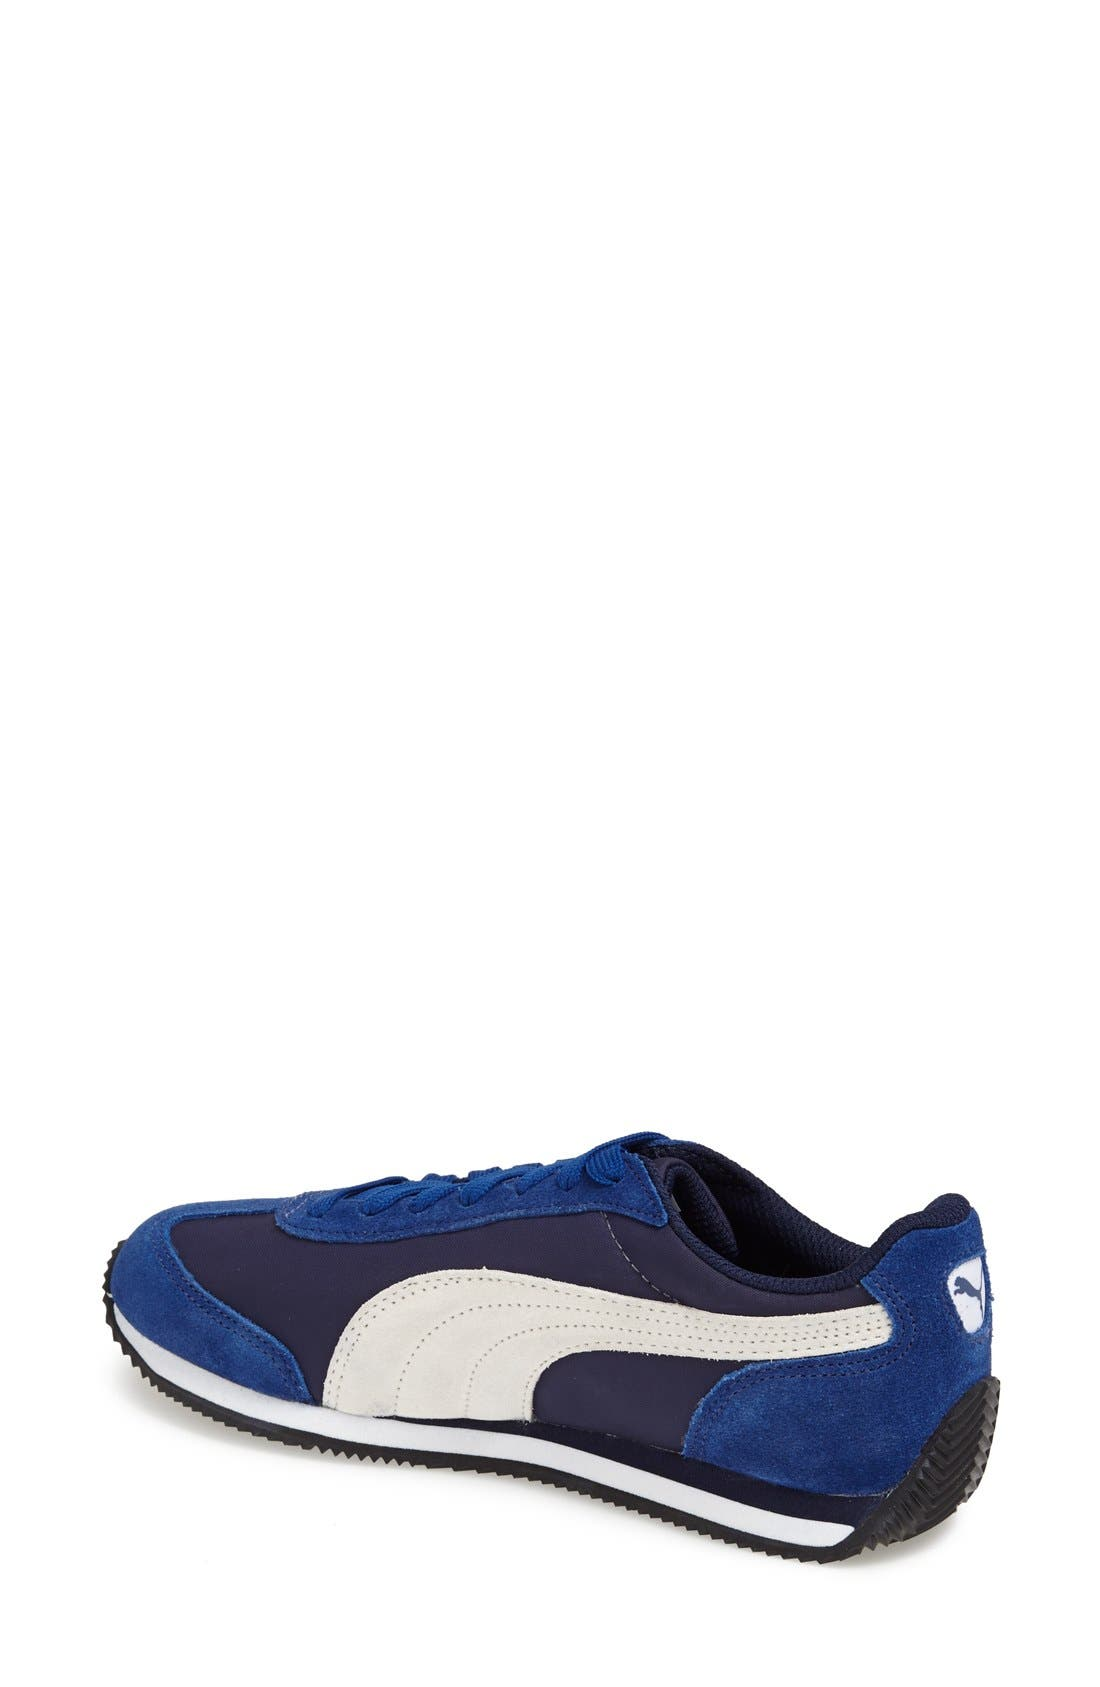 Alternate Image 2  - PUMA 'Rio Speed NL' Sneaker (Women)